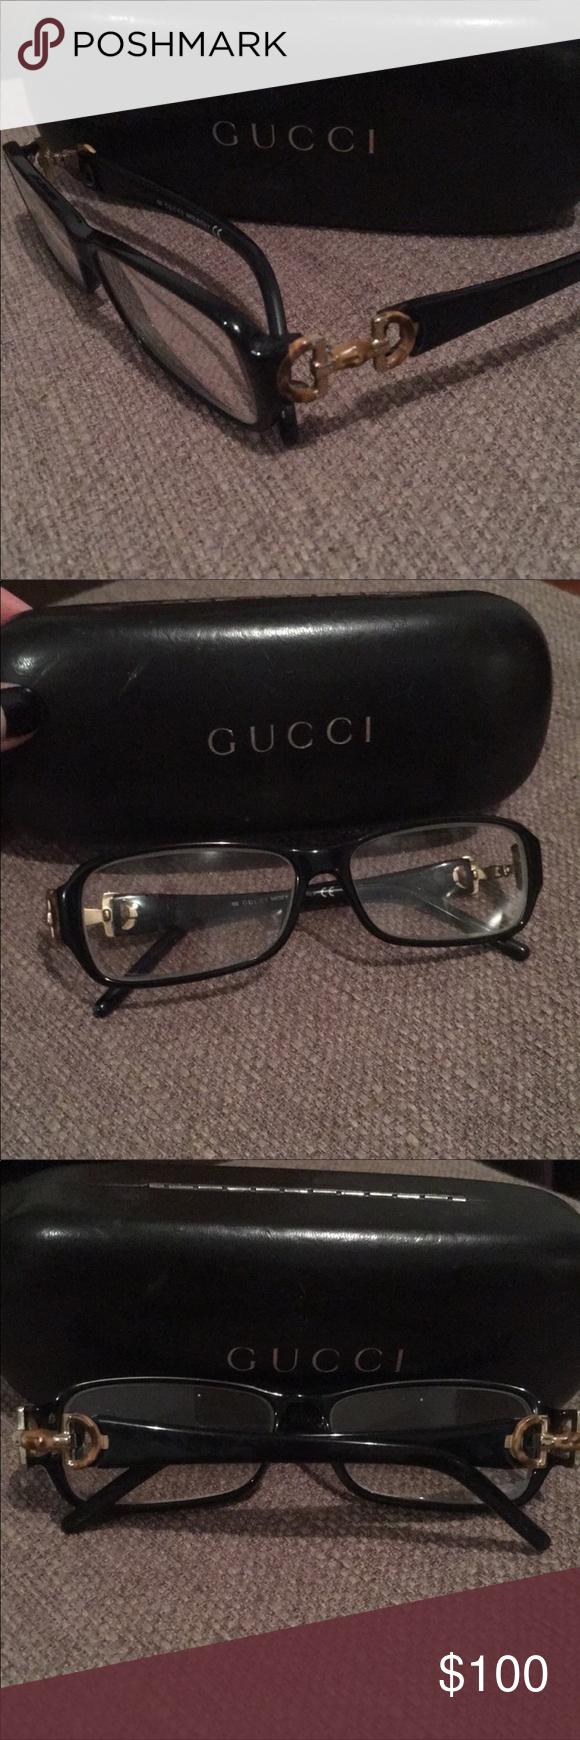 40287e8950cf7 100% Authentic Gucci Eye Glasses w Case. Used Gucci Eye Glasses Bamboo Logo  great condition! Gucci Accessories Glasses